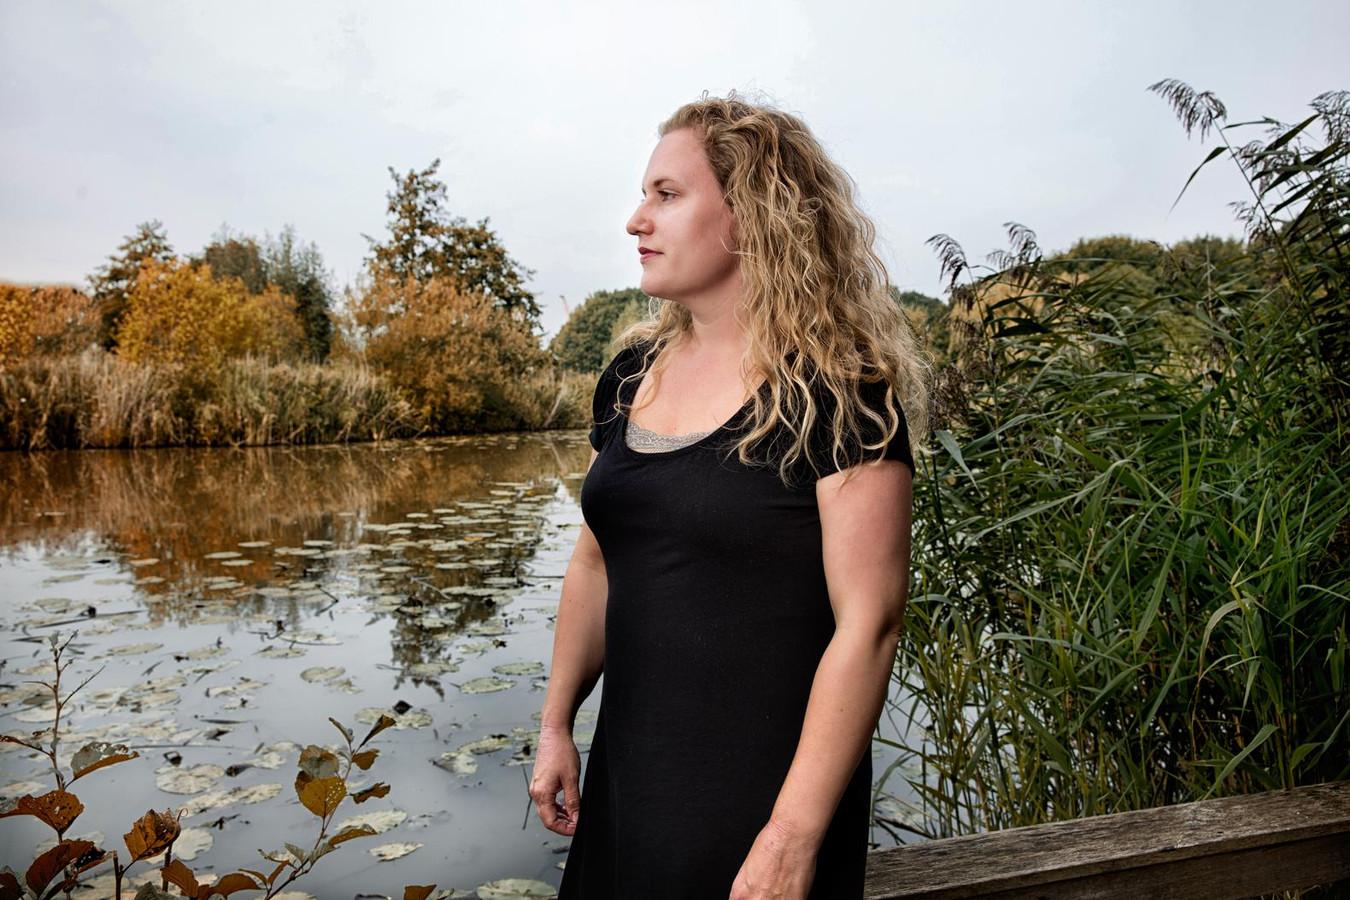 Ingrid Kamerling